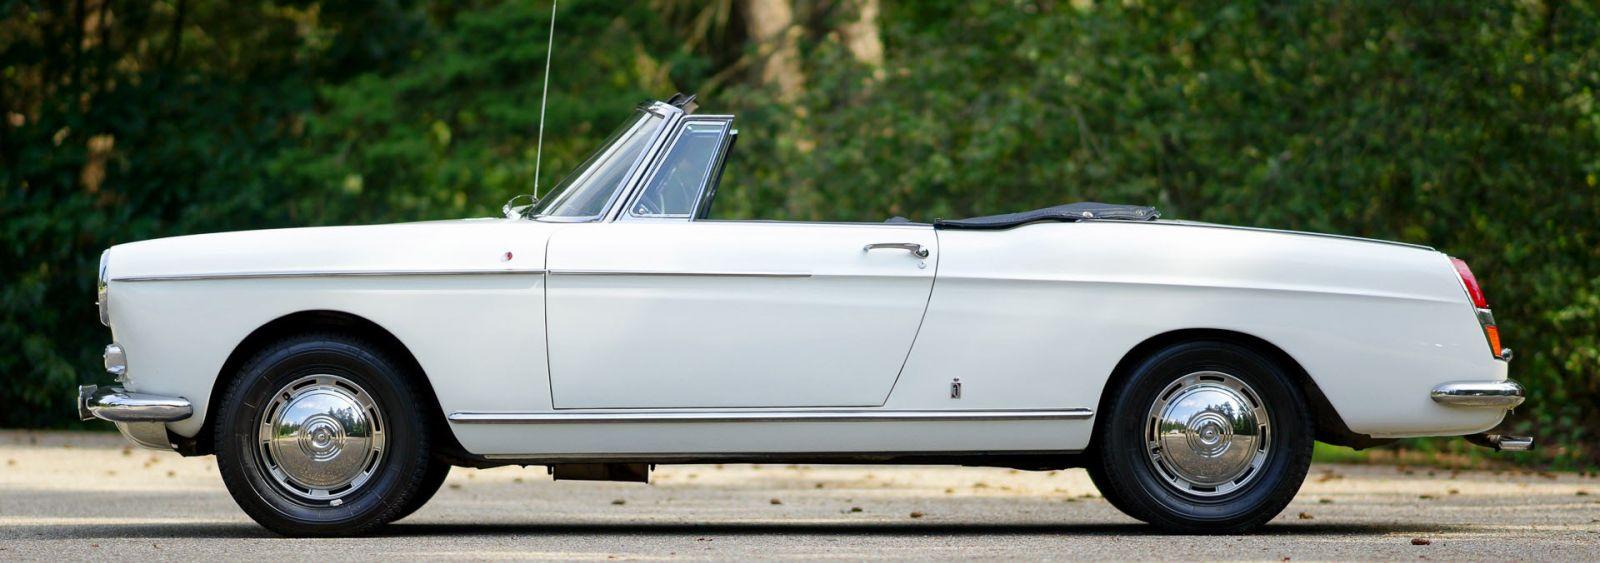 peugeot 404 cabriolet 1966 welcome to classicargarage. Black Bedroom Furniture Sets. Home Design Ideas